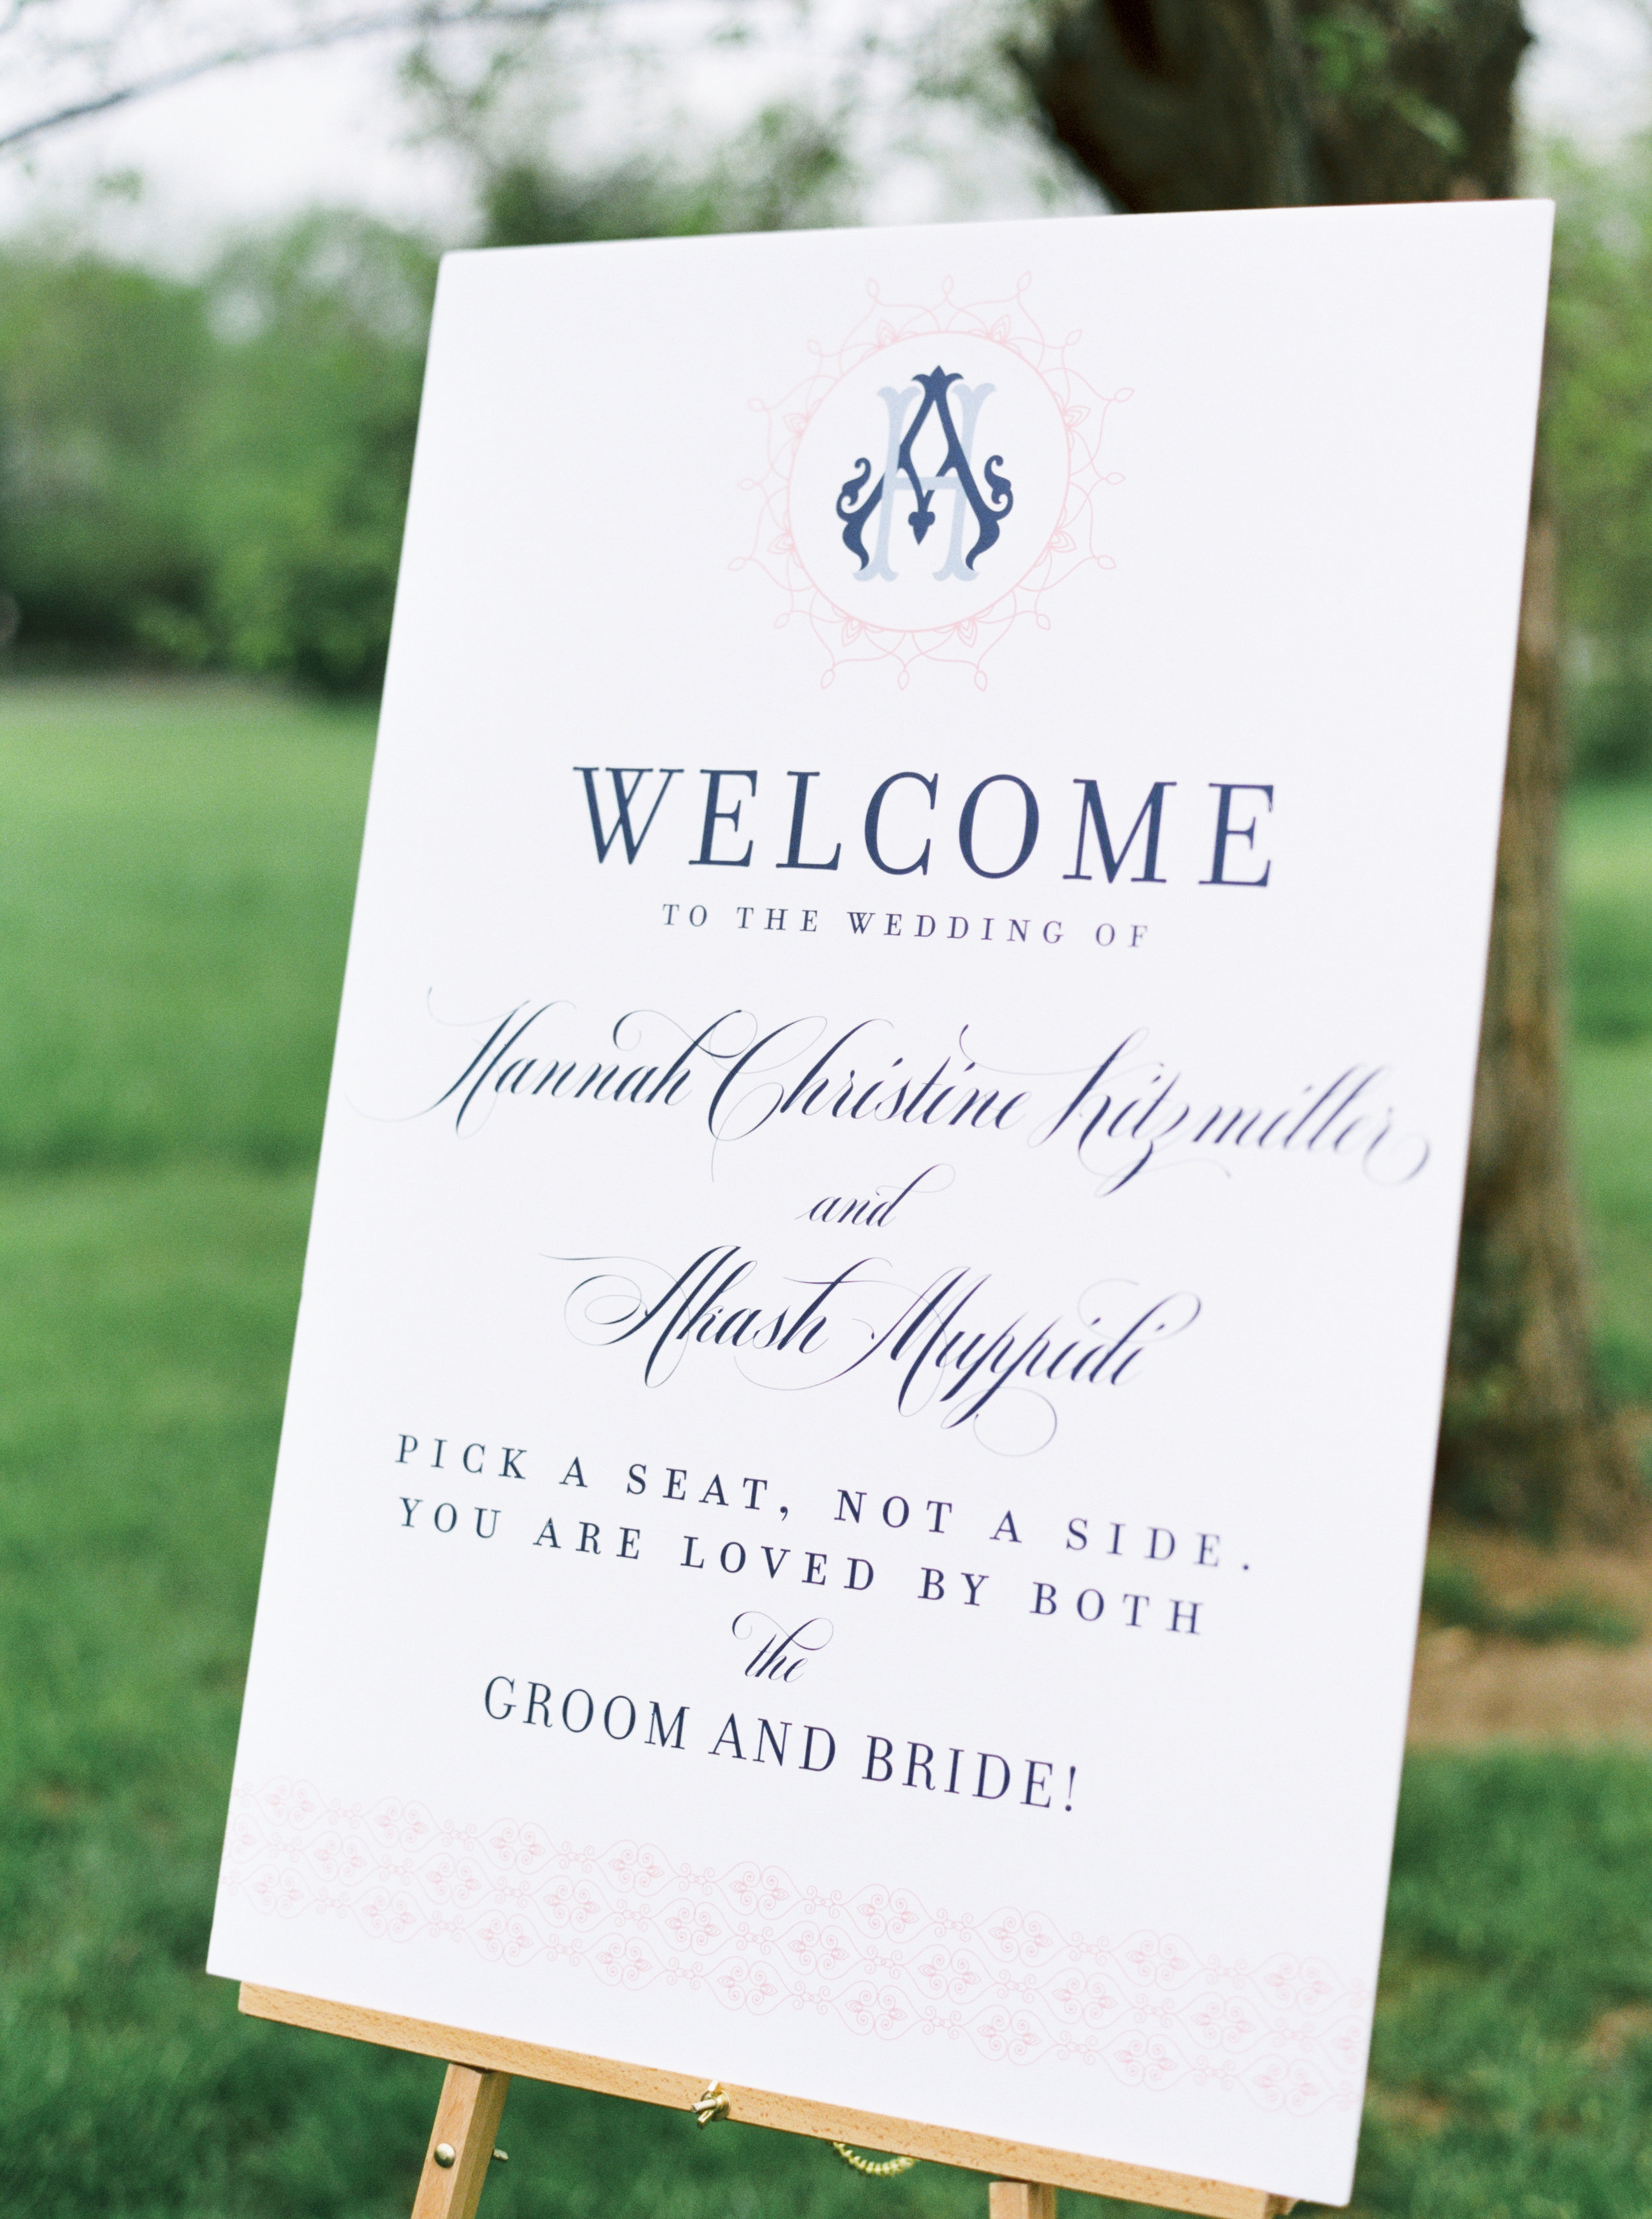 Cincinnati wedding day with south Indian motif welcome wedding signage